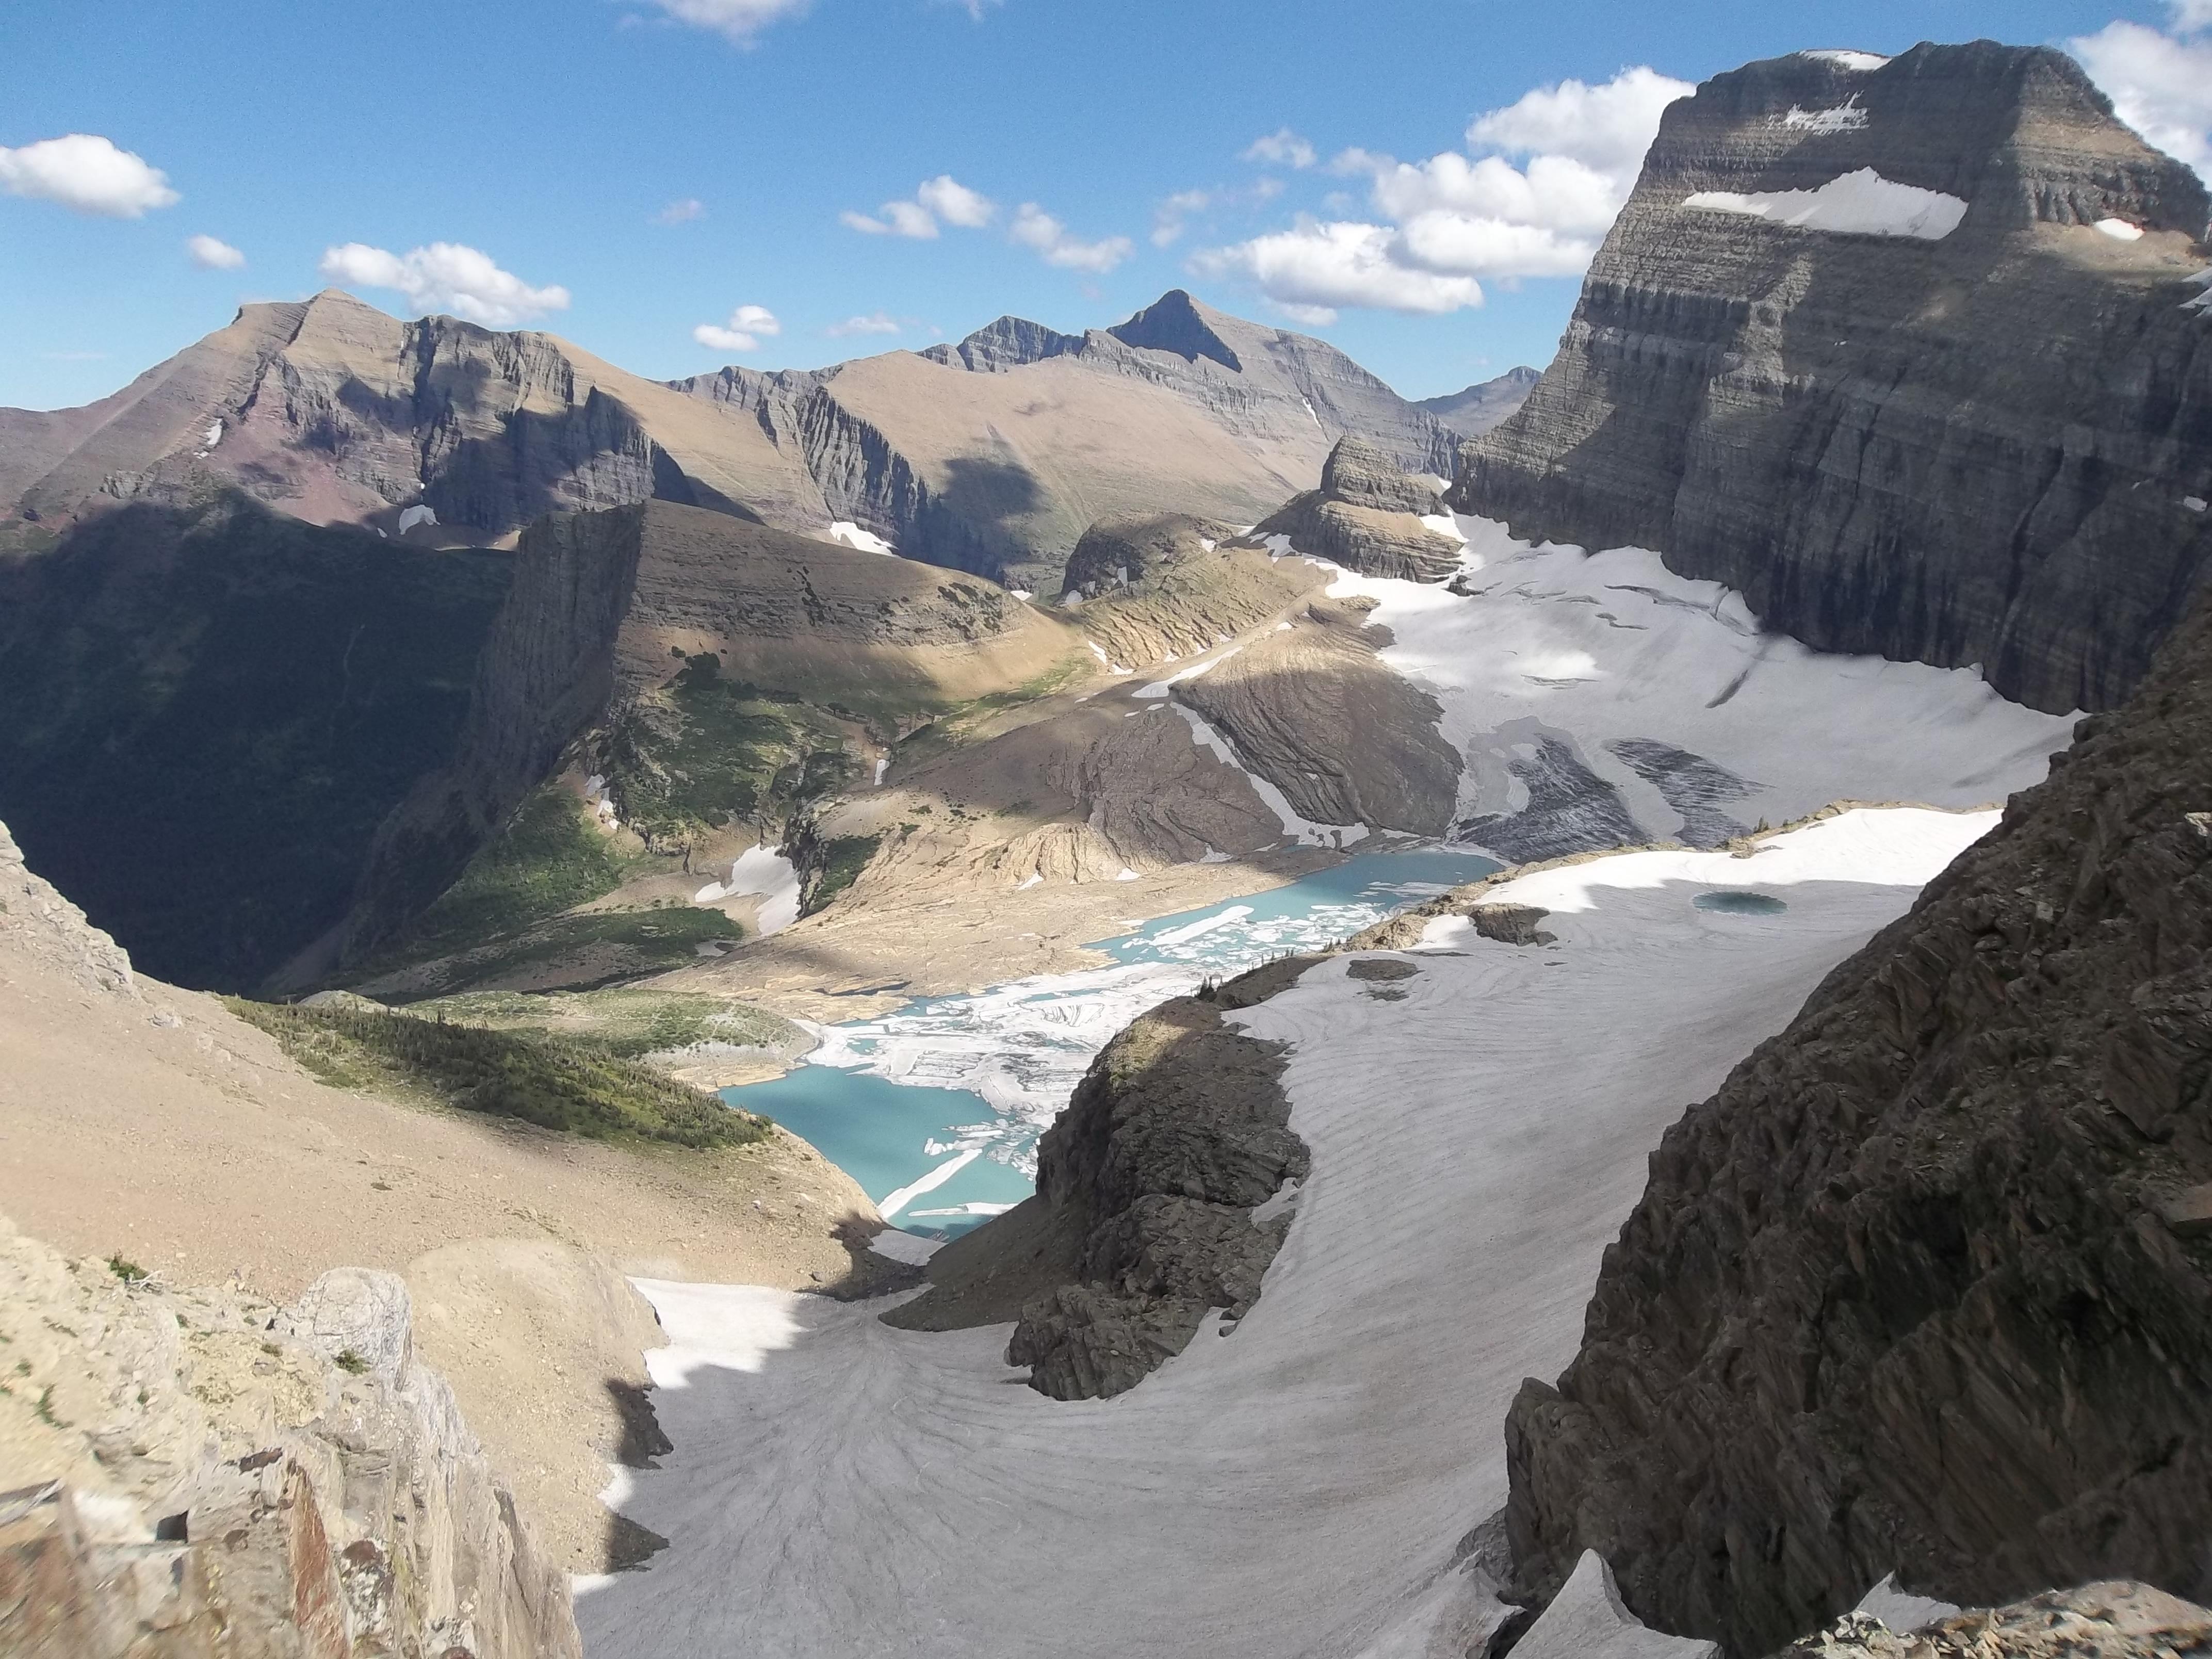 Grinnell Glacier in Glacier National Park, Montana. Photo taken on August 23, 2012.